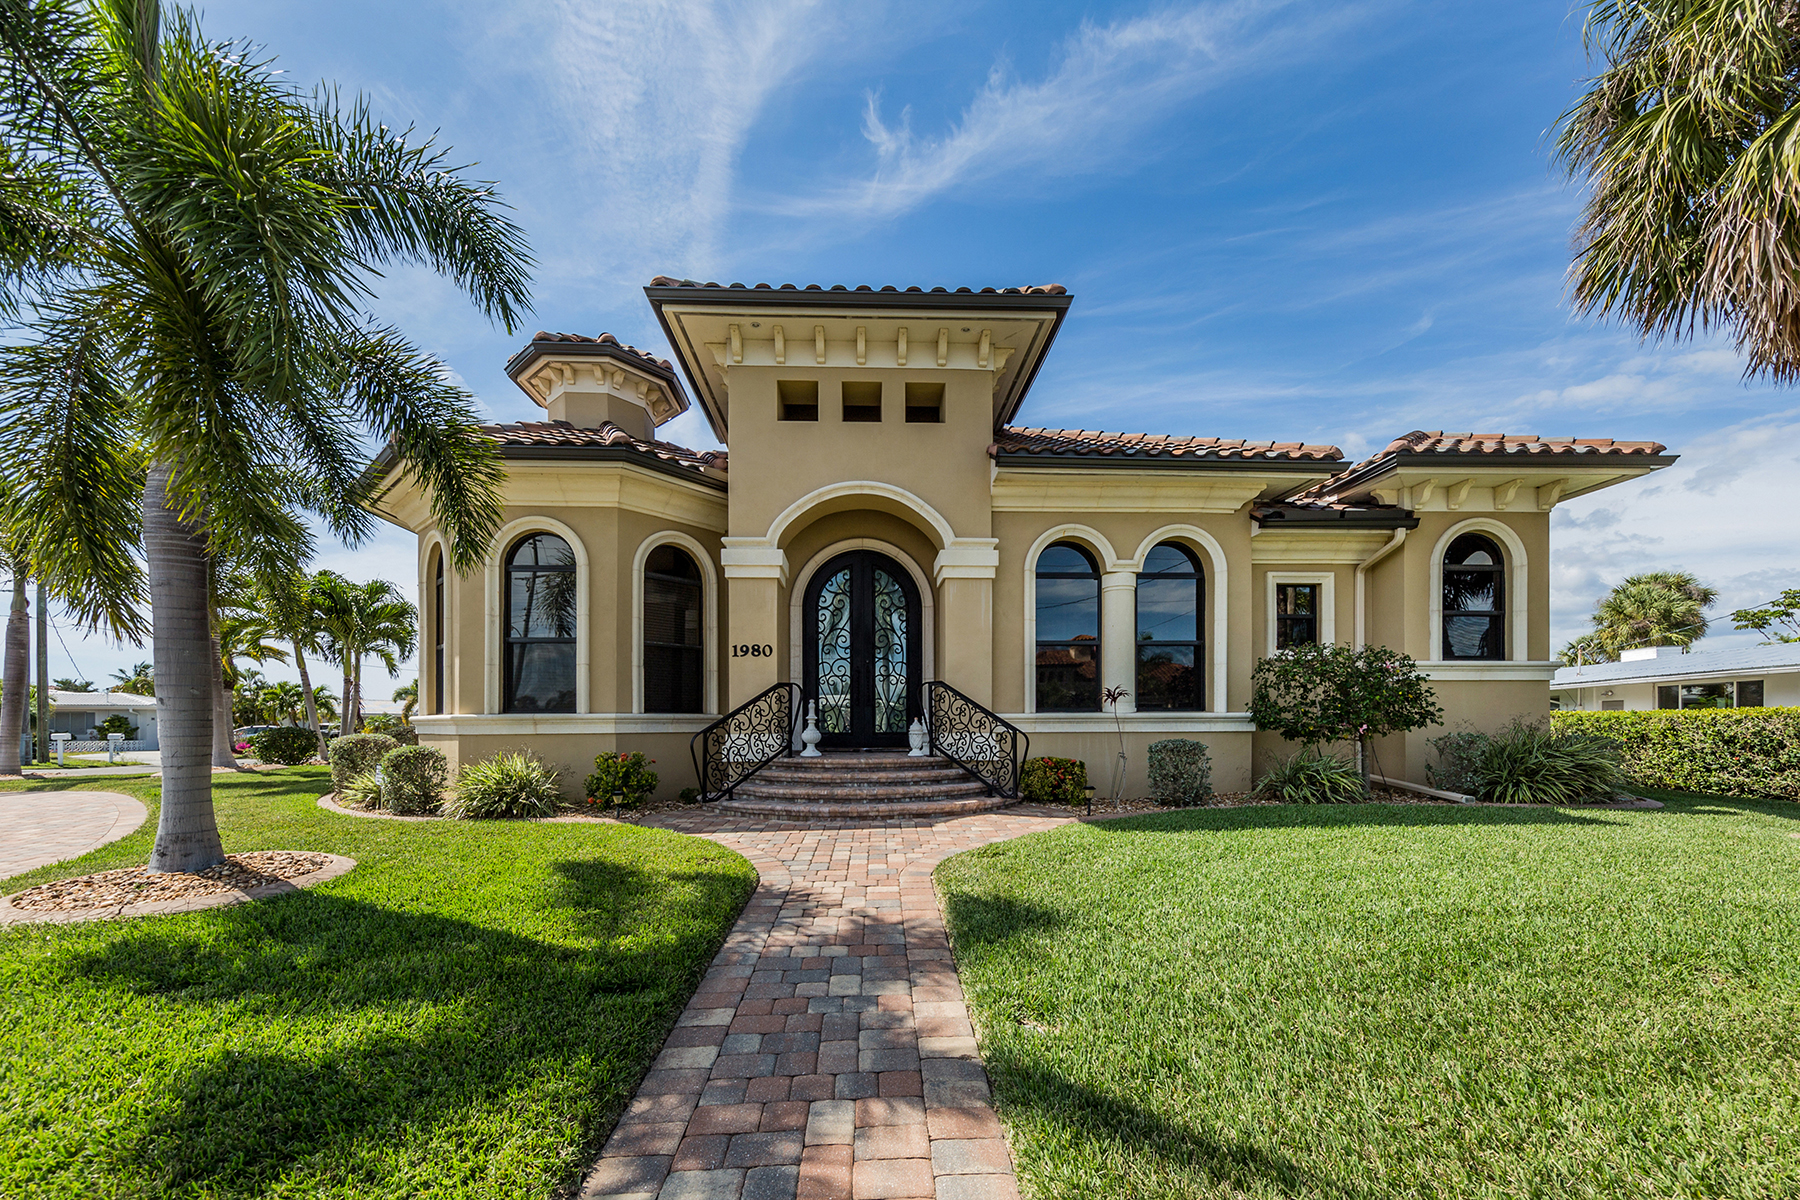 Single Family Homes for Active at PUNTA GORDA ISLES 1980 W Marion Ave Punta Gorda, Florida 33950 United States